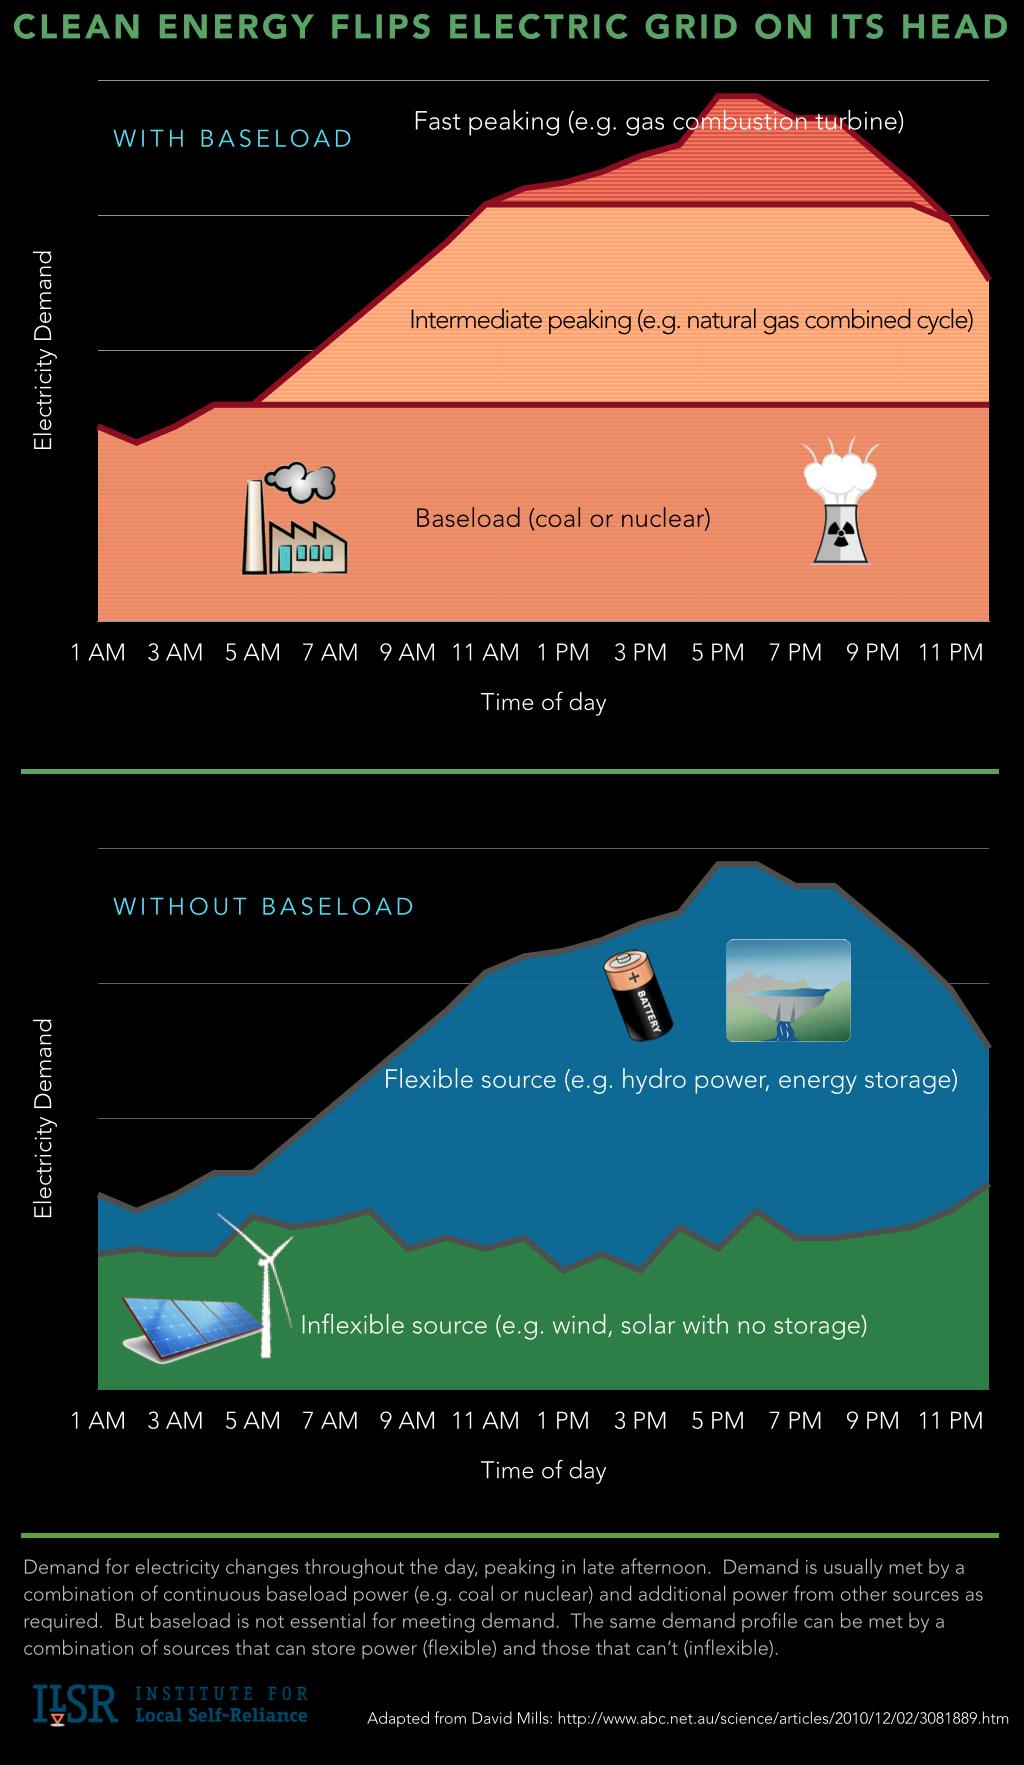 clean energy flips the grid - ilsr infographic v2